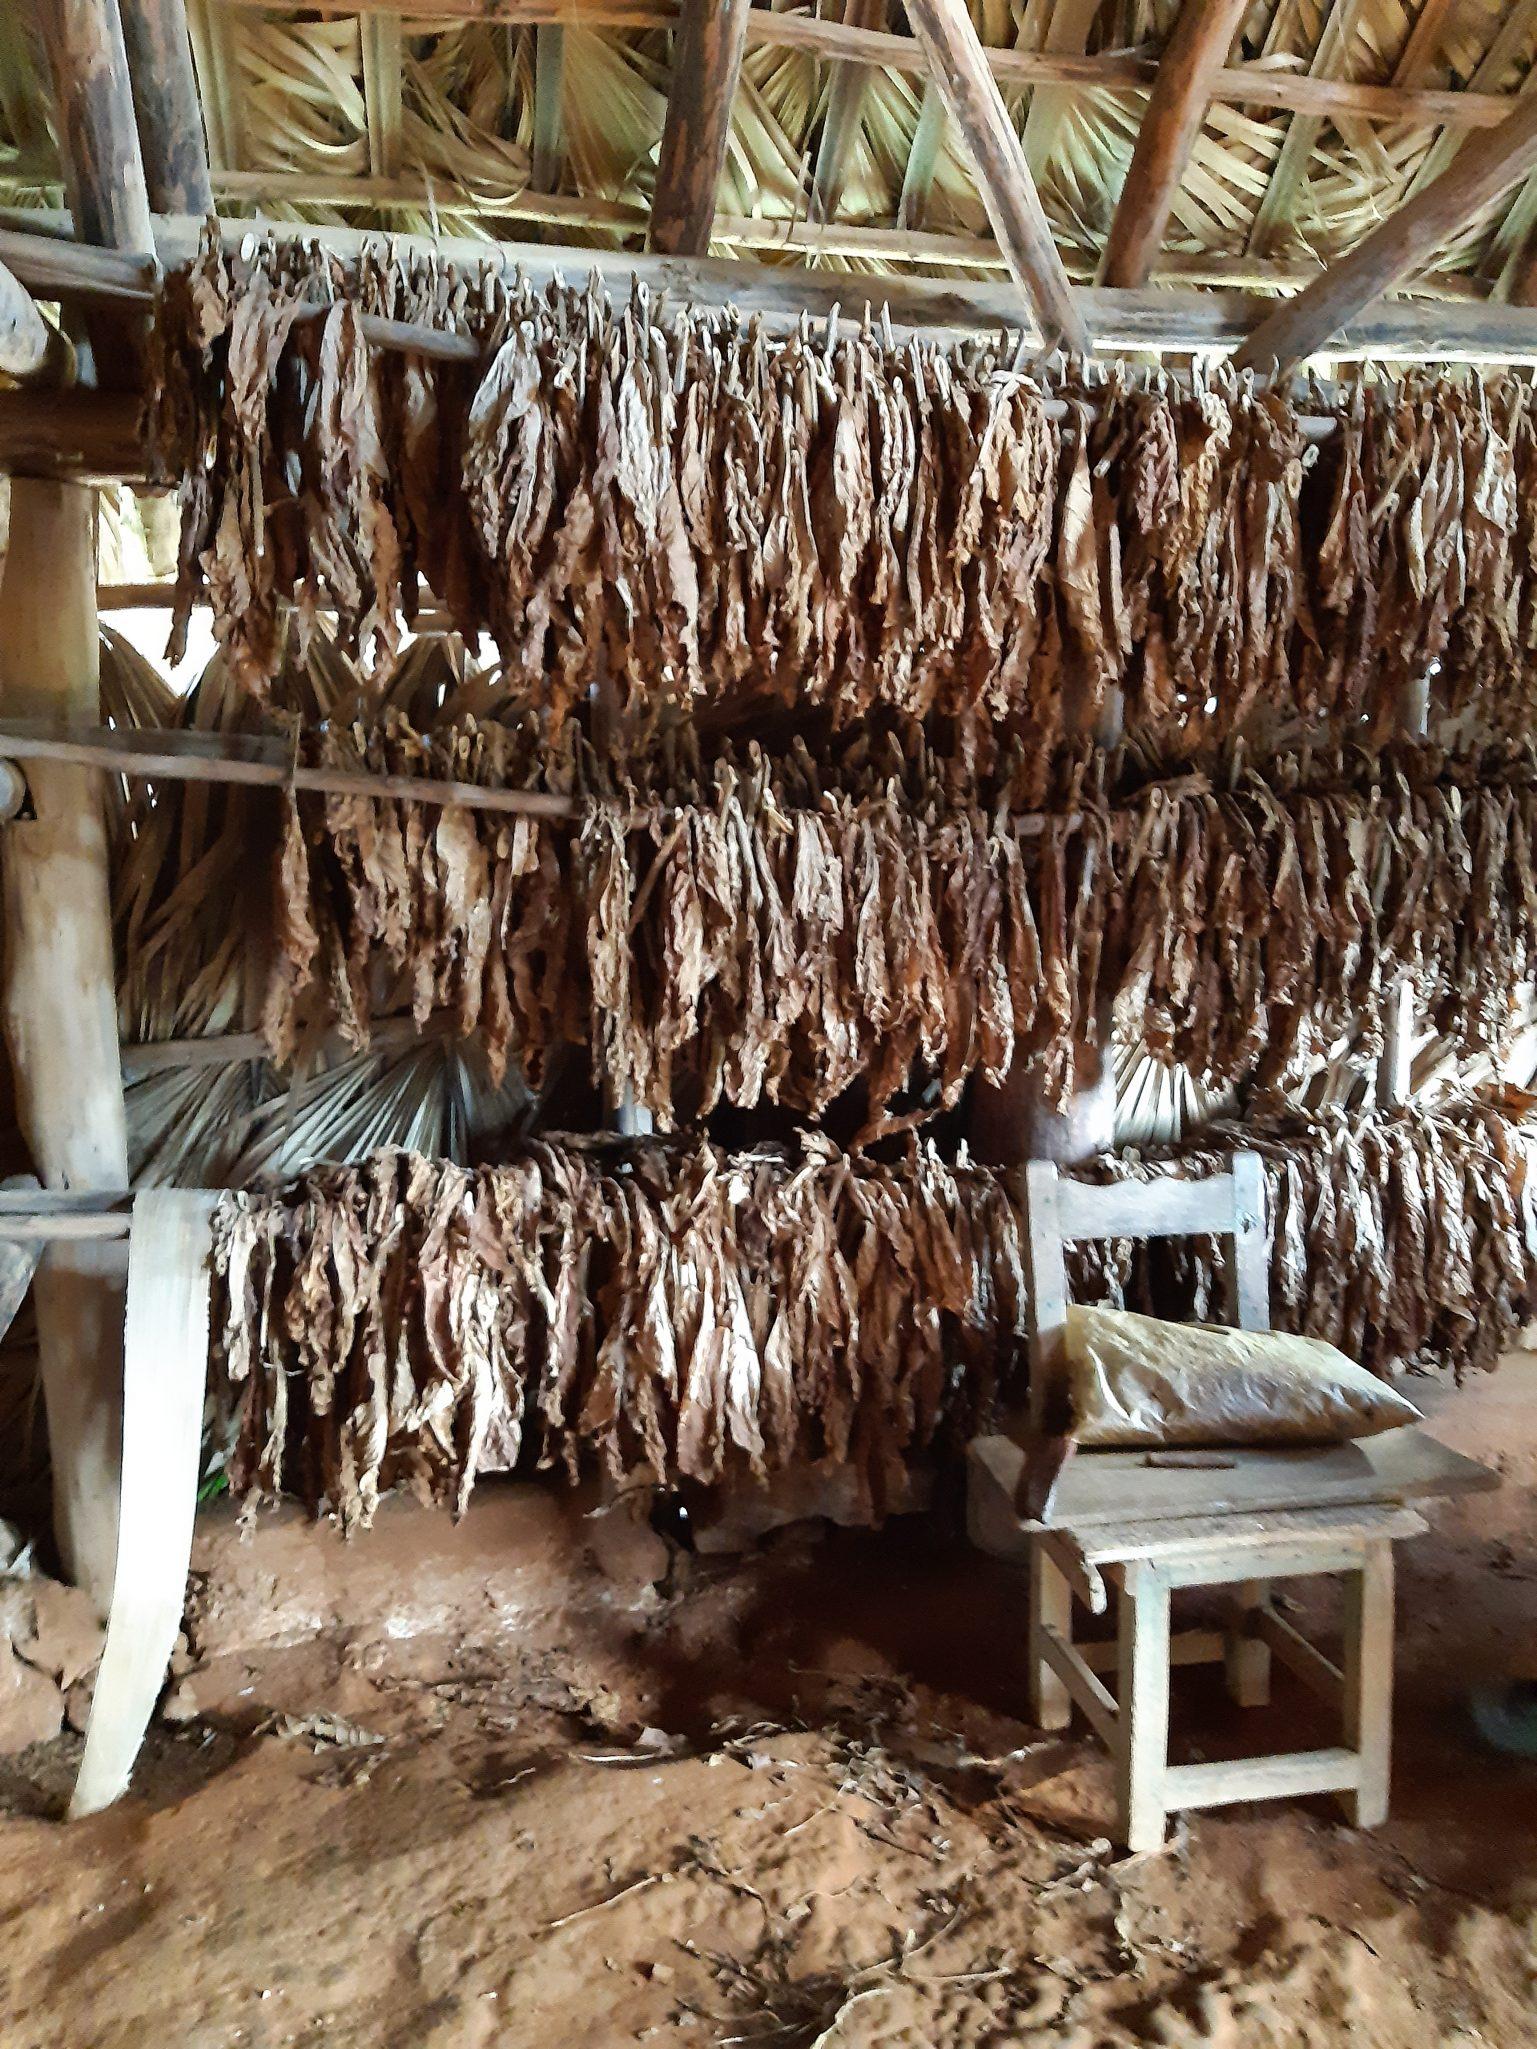 Tabakbauern Tabak zum trocknen